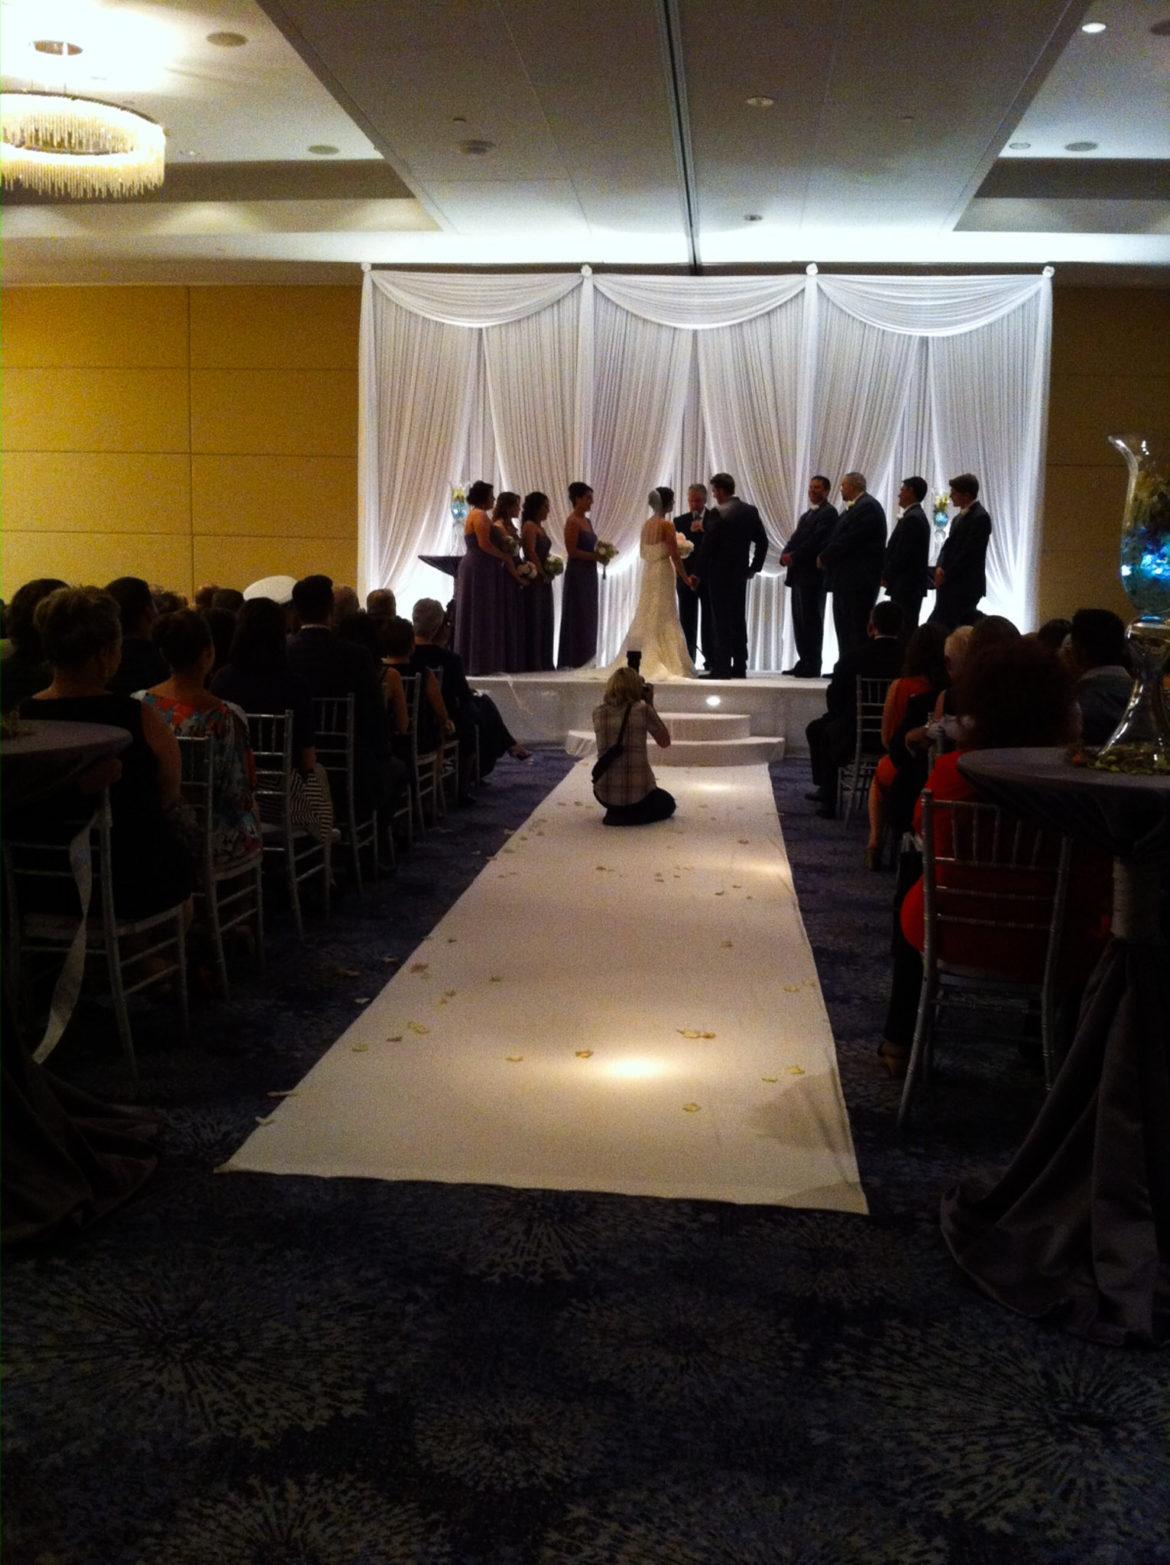 Elegant_Event_Lighting_Chicago_Renaissance_Schaumburg_Wedding_Uplighting_White_Backdrop_Draping_Stage_Cover_moon_Steps_Aisle_Runner